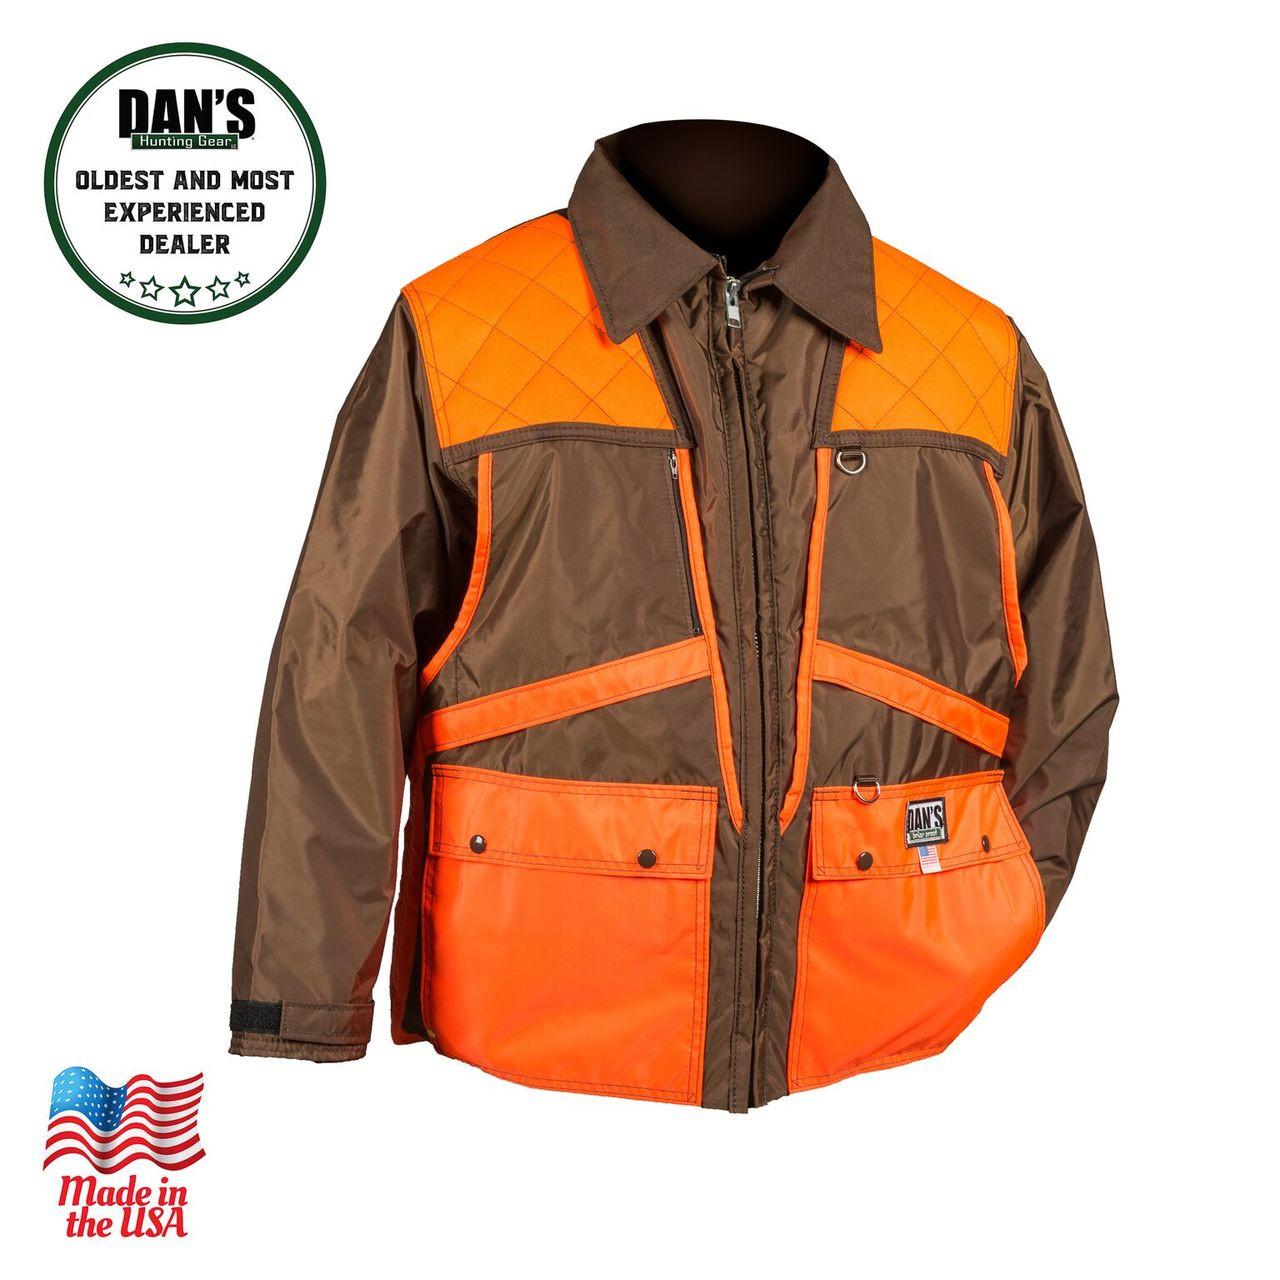 15074f98ac373 Dan's Hunting Gear - 423 - Briarproof Game Coat | Windwalker Outdoors |  Montana U.S.A.